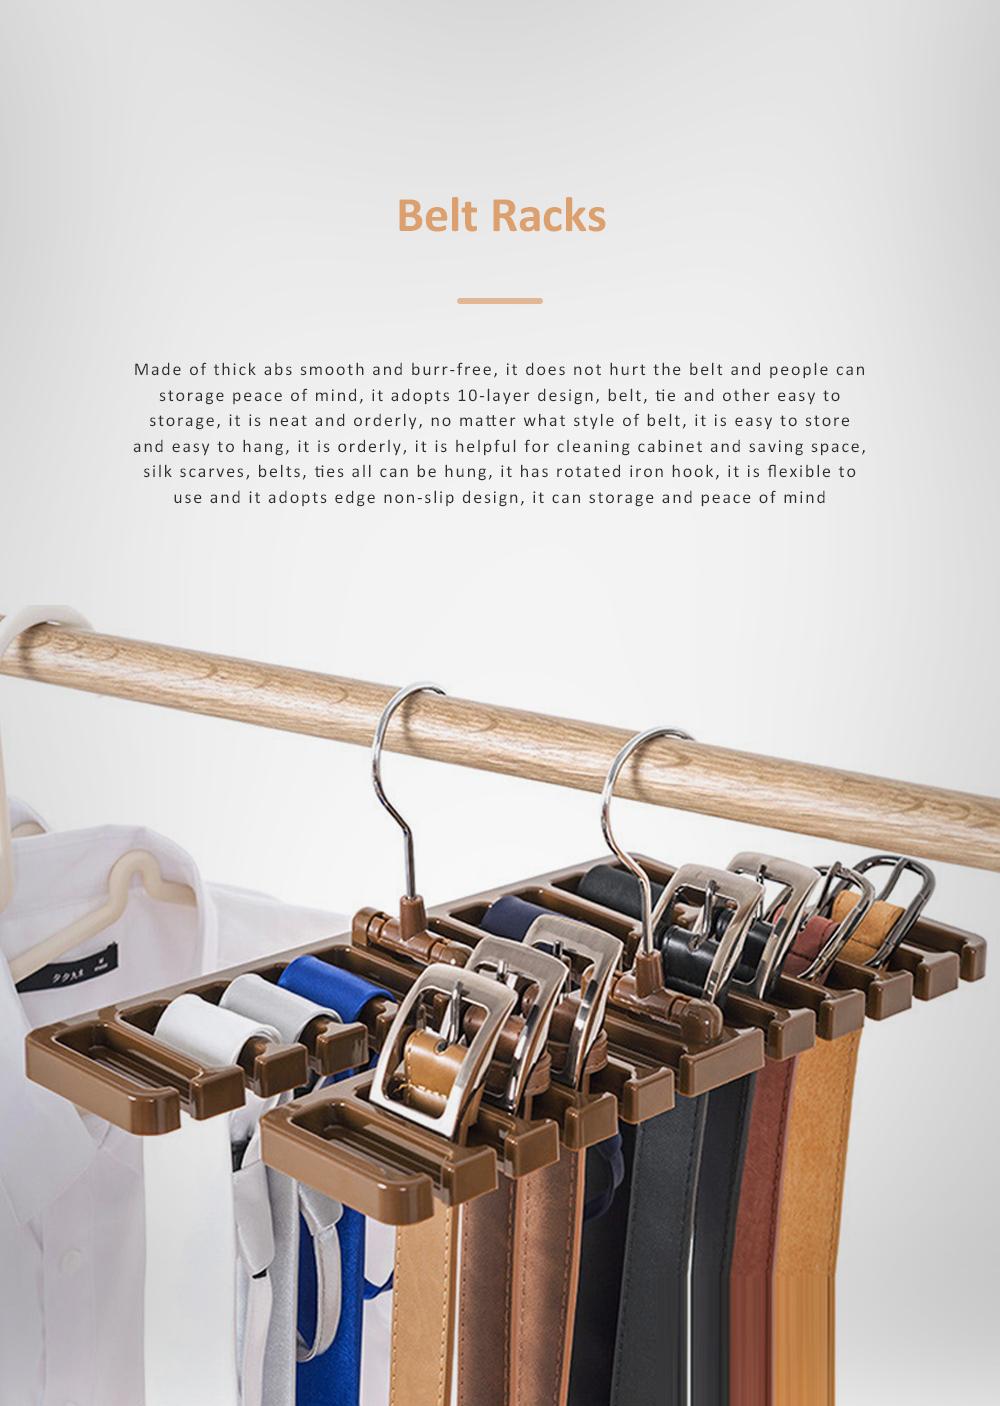 Hot Sale Tie Storage Rack Hanger Belt Racks Scarf Racks Abs Iron Large Belt Storage 0